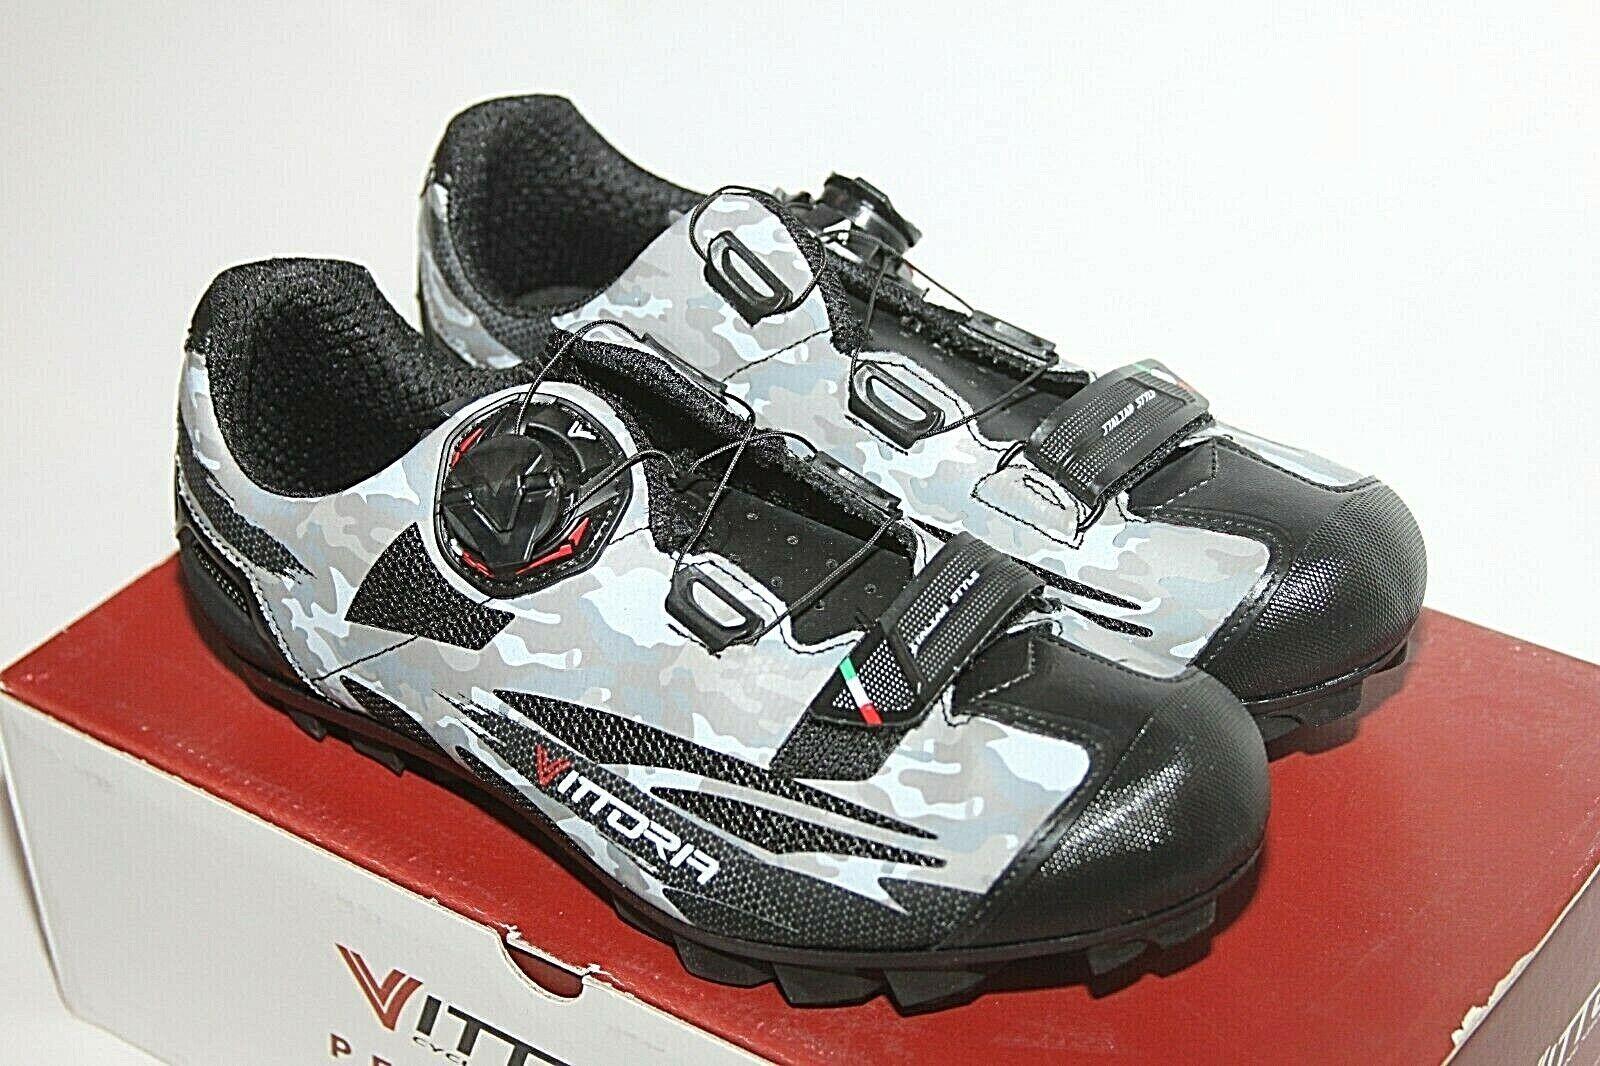 Mens Vittoria Captor SSP MTB shoes Grey Camo Cycling shoes   Sz 41 8 NIB BOA  with 100% quality and %100 service